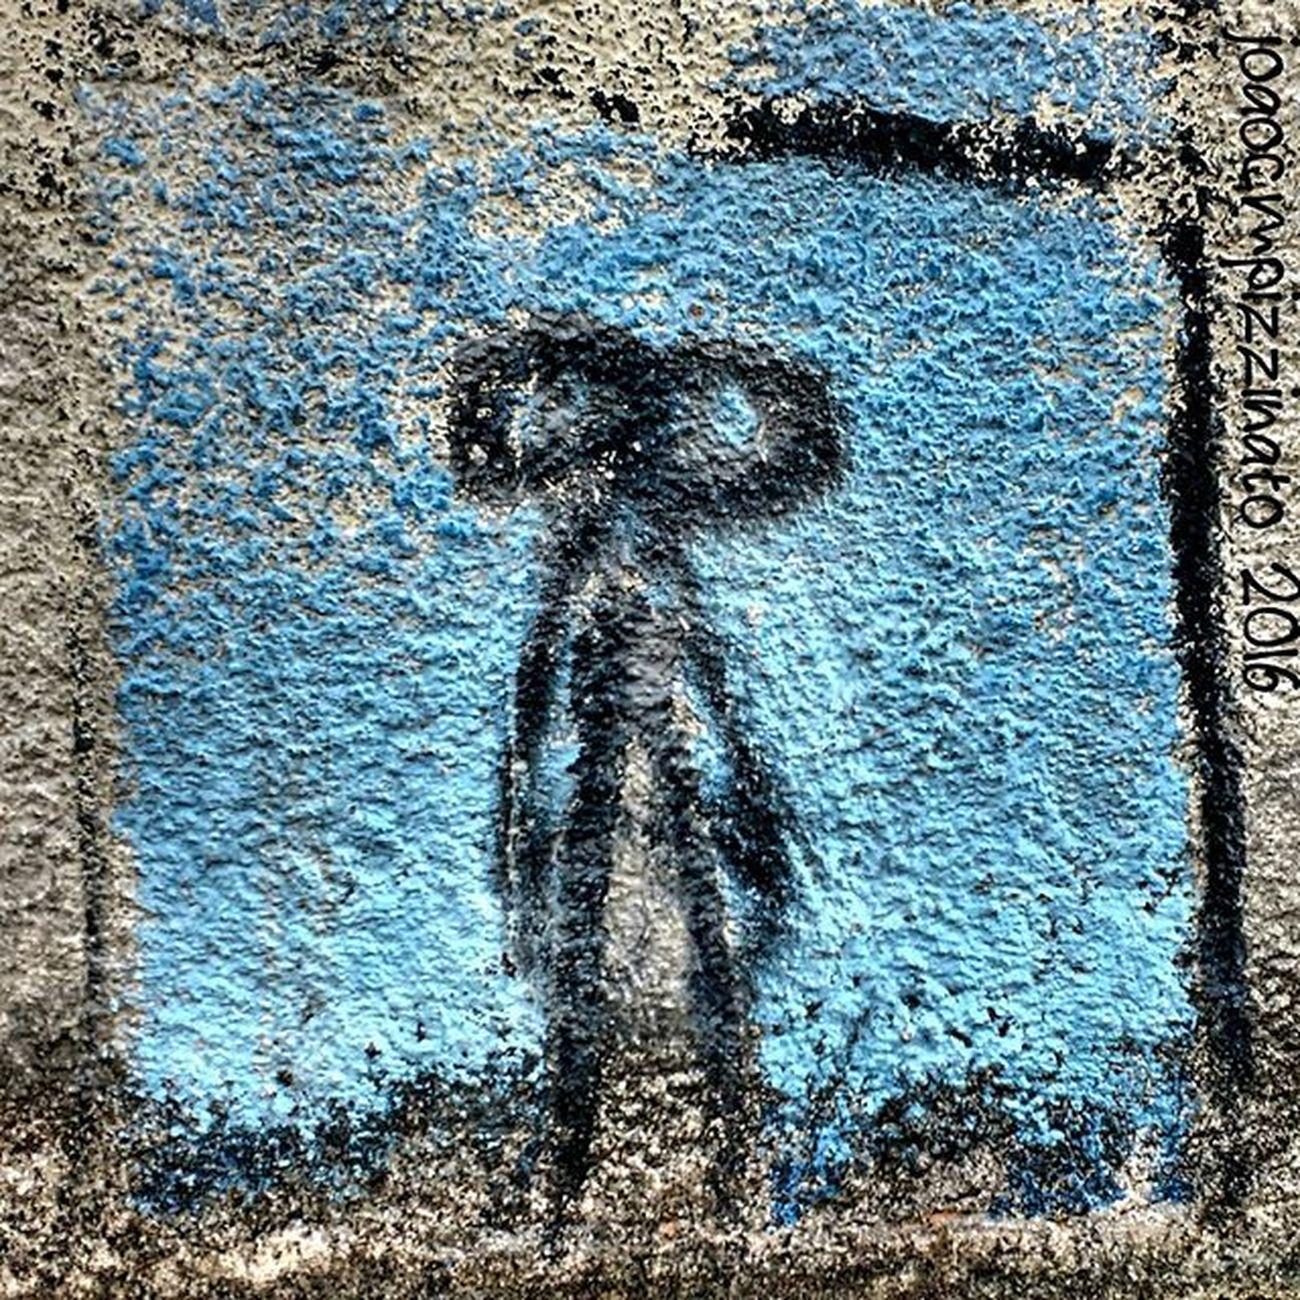 Aedes aegypti na área. Cuidado. Graffiti Graffitiart Art Streetart UrbanART Streetphotography Urban Streetphoto_brasil Colors City Zonasul Saopaulo Brasil Photograph Photography Mundoruasp Olhonaruasp Flaming_abstracts Urbexbrasil Urbexsp